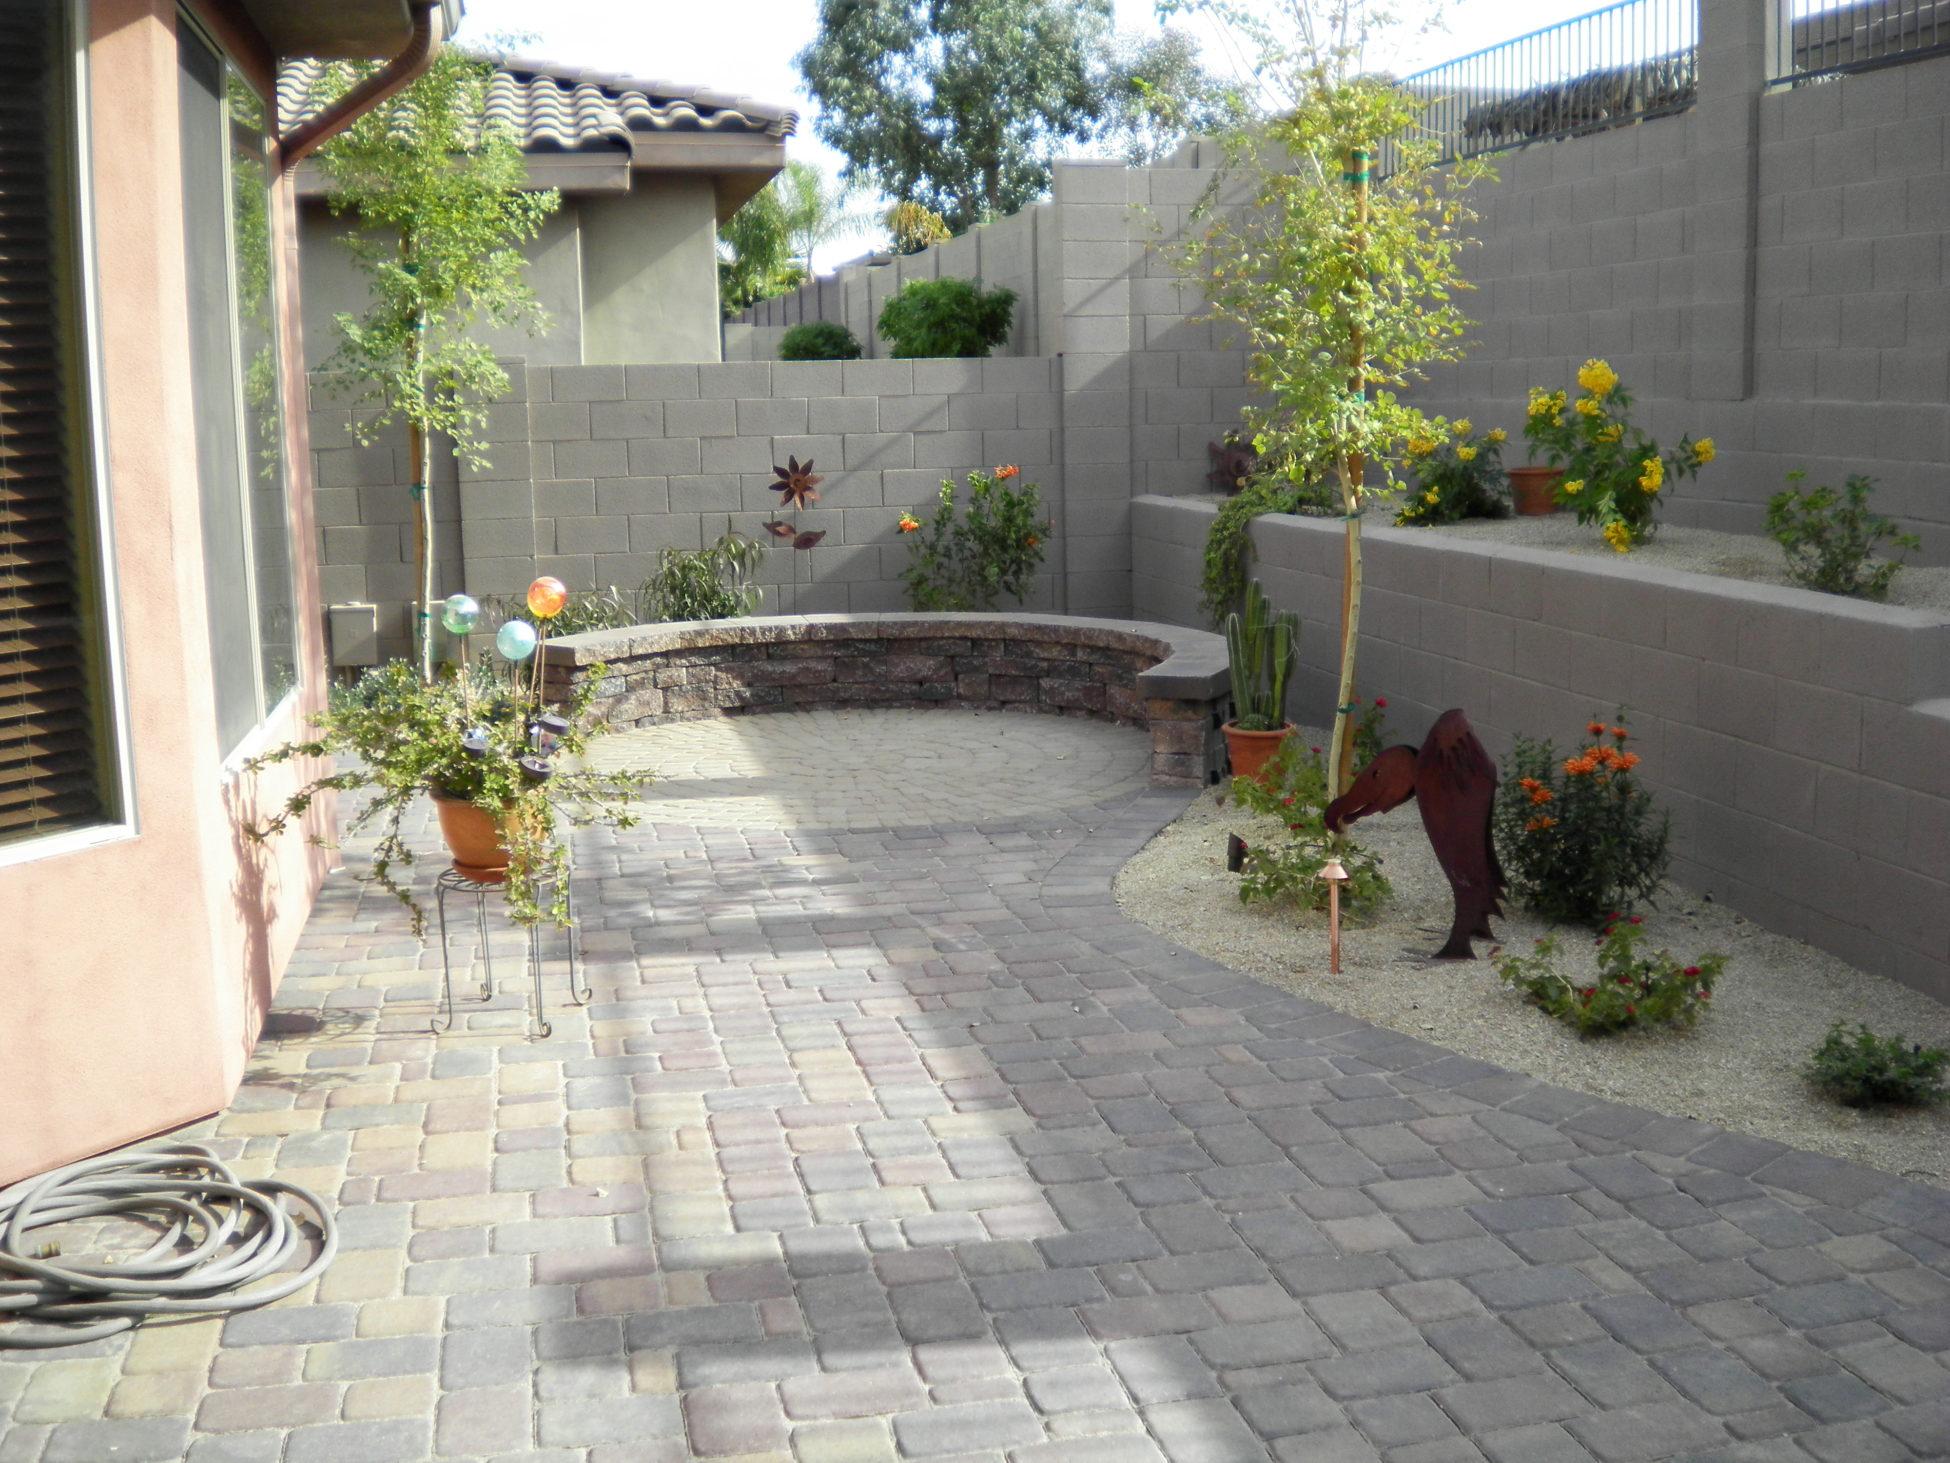 2 By 2 Concrete Pavers | Home design ideas